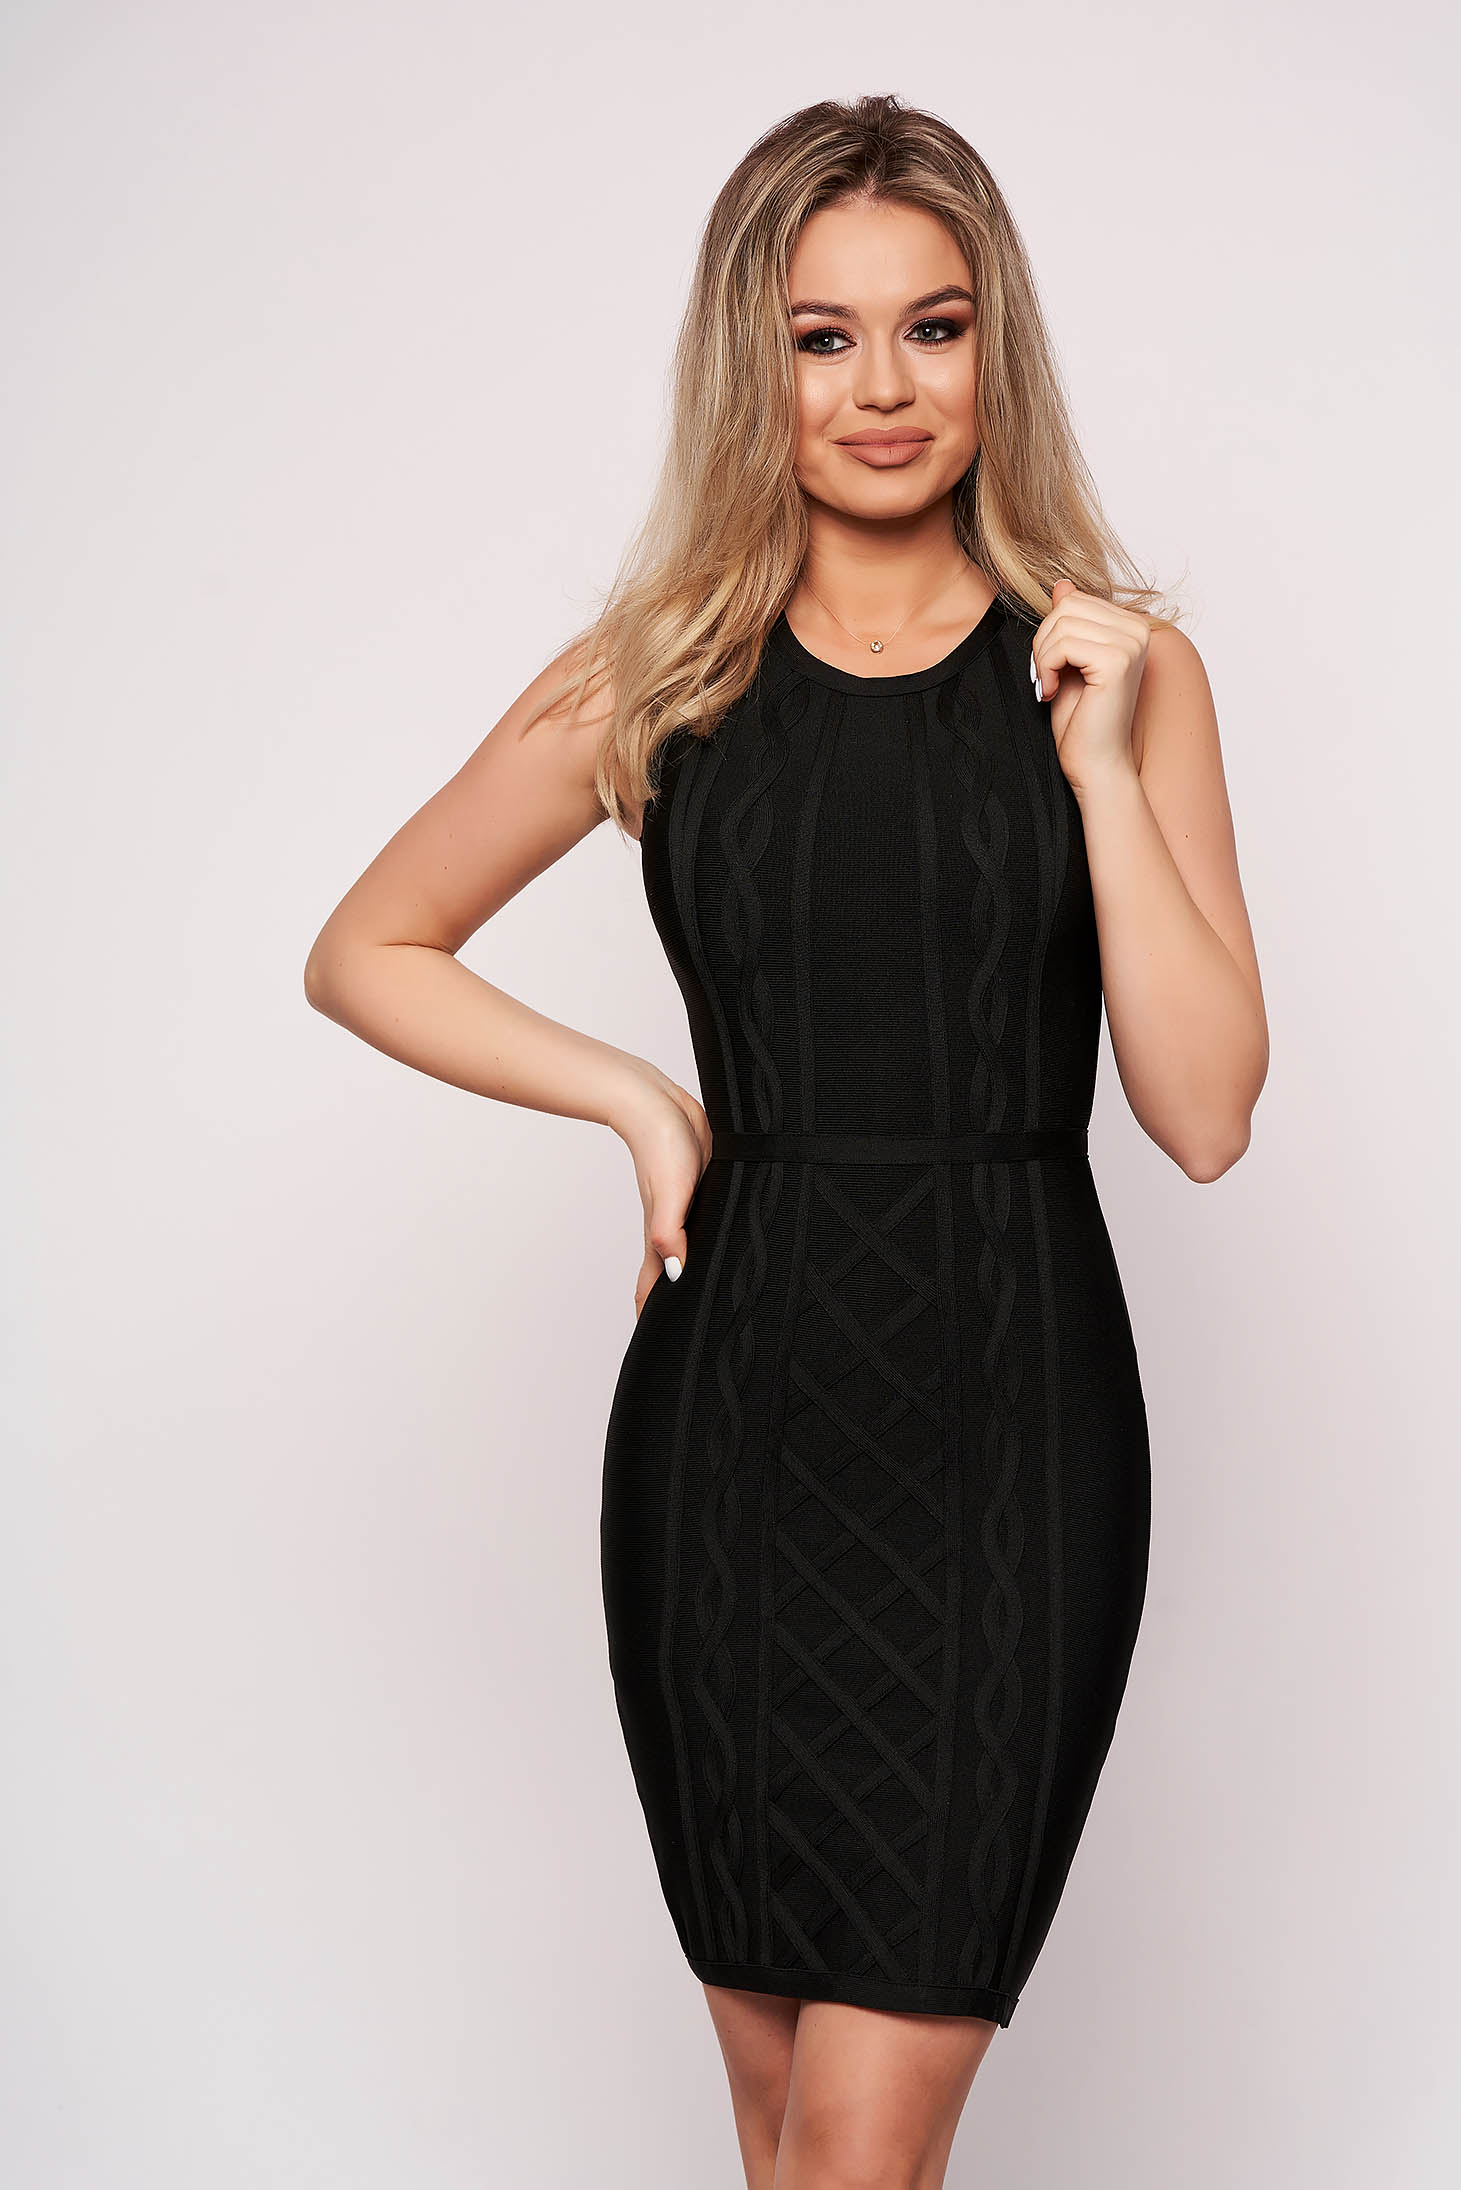 Black dress clubbing short cut pencil sleeveless stretch